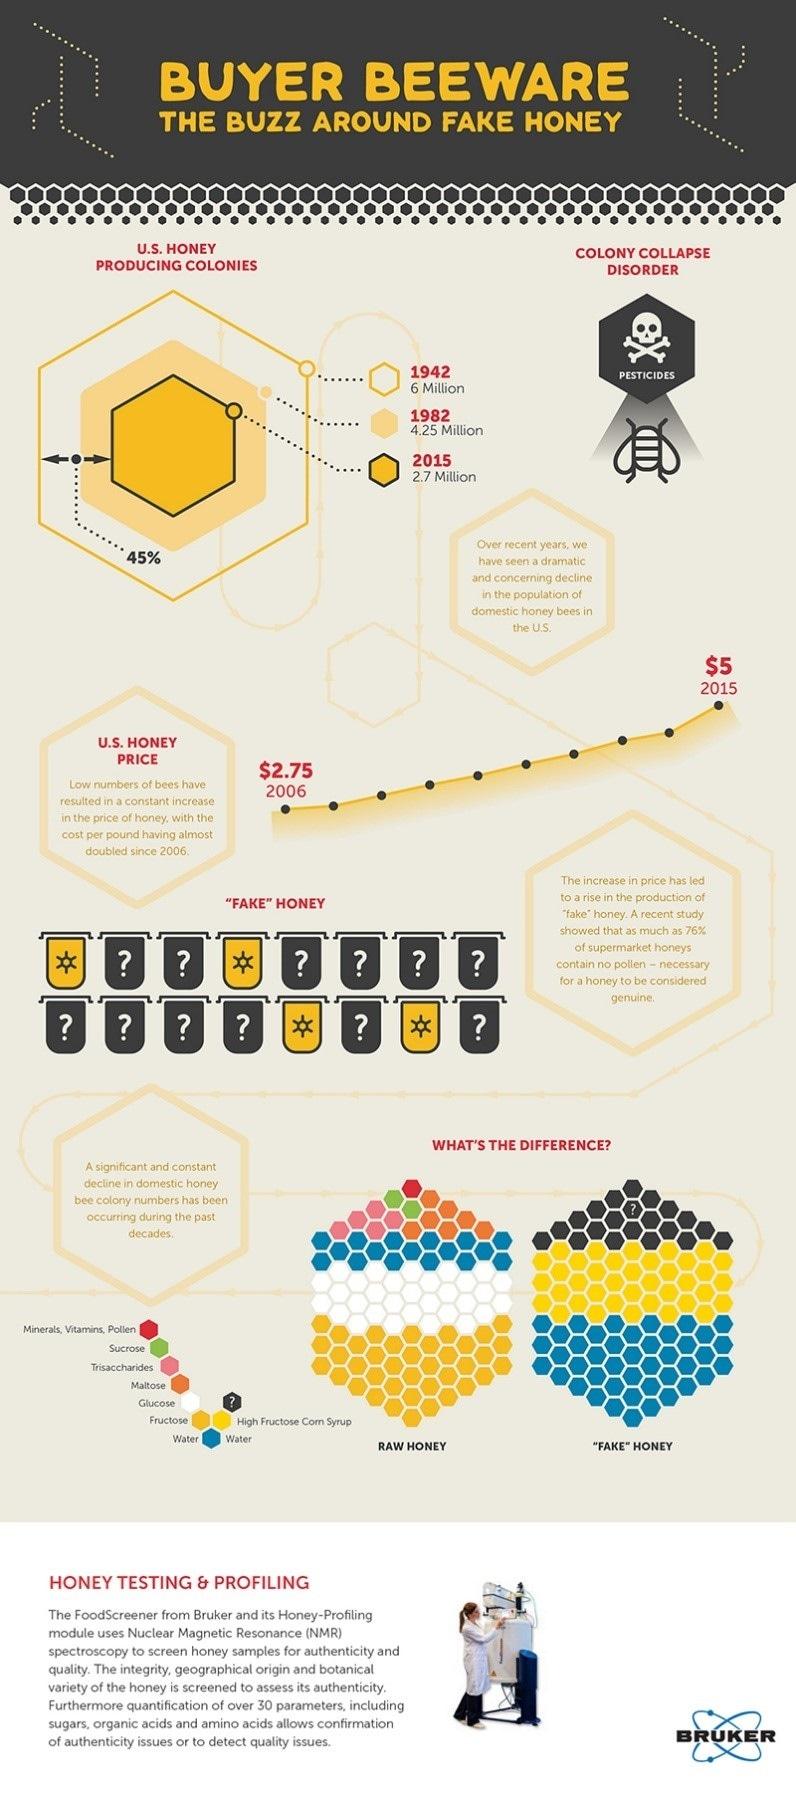 Miel-Perfilado de Bruker RMN infographic por AZoNetwork